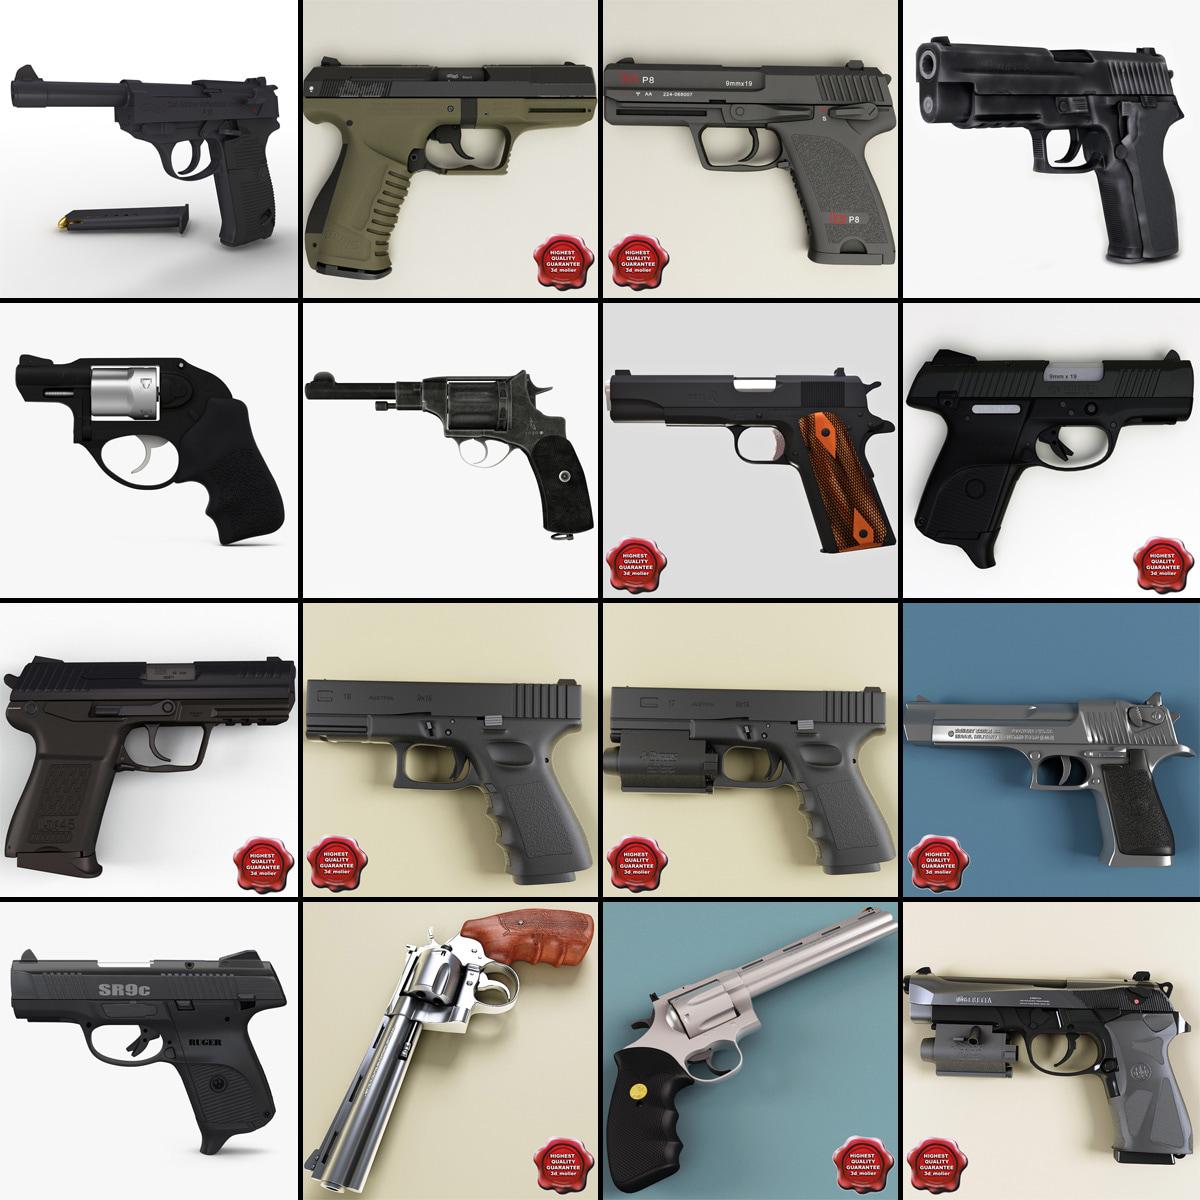 Pistols_Collection_V8_000.jpg